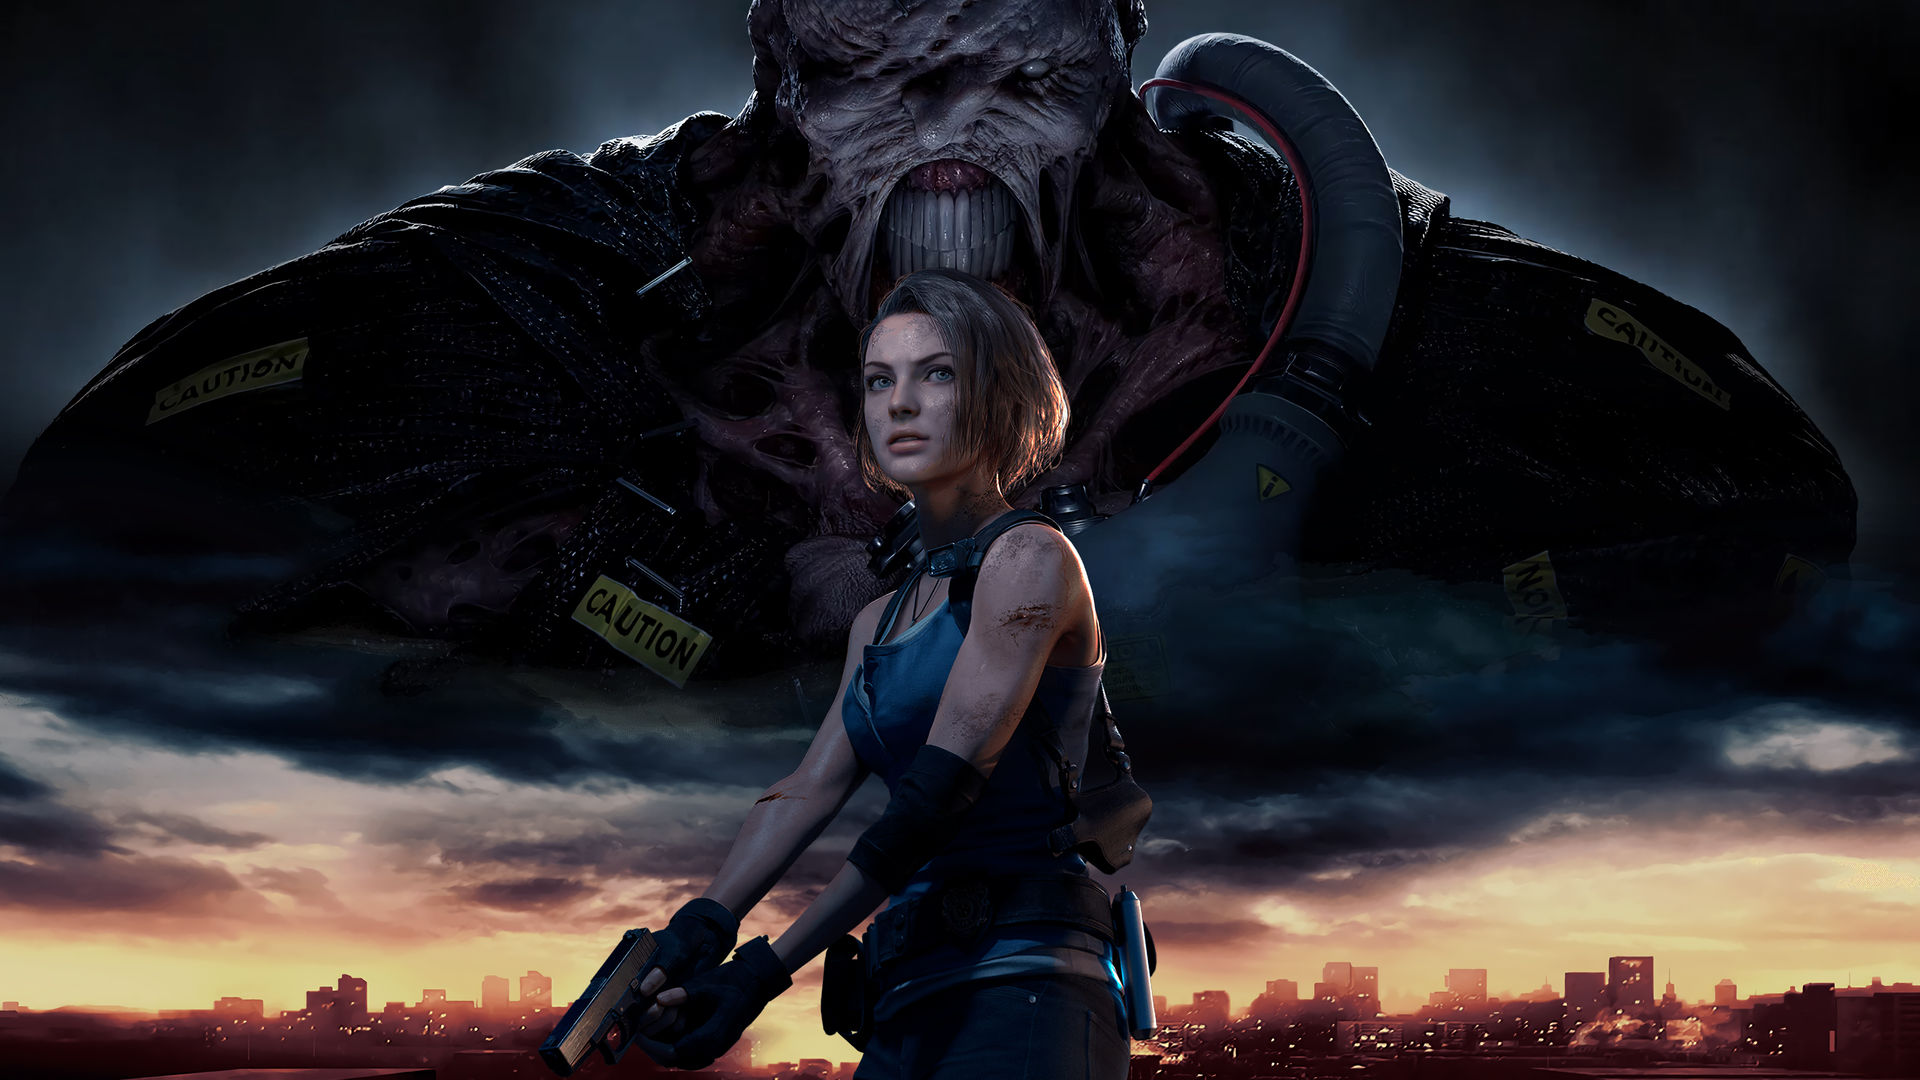 Resident Evil 3 Remake Wallpaper Jill Valentine By Nightfurious